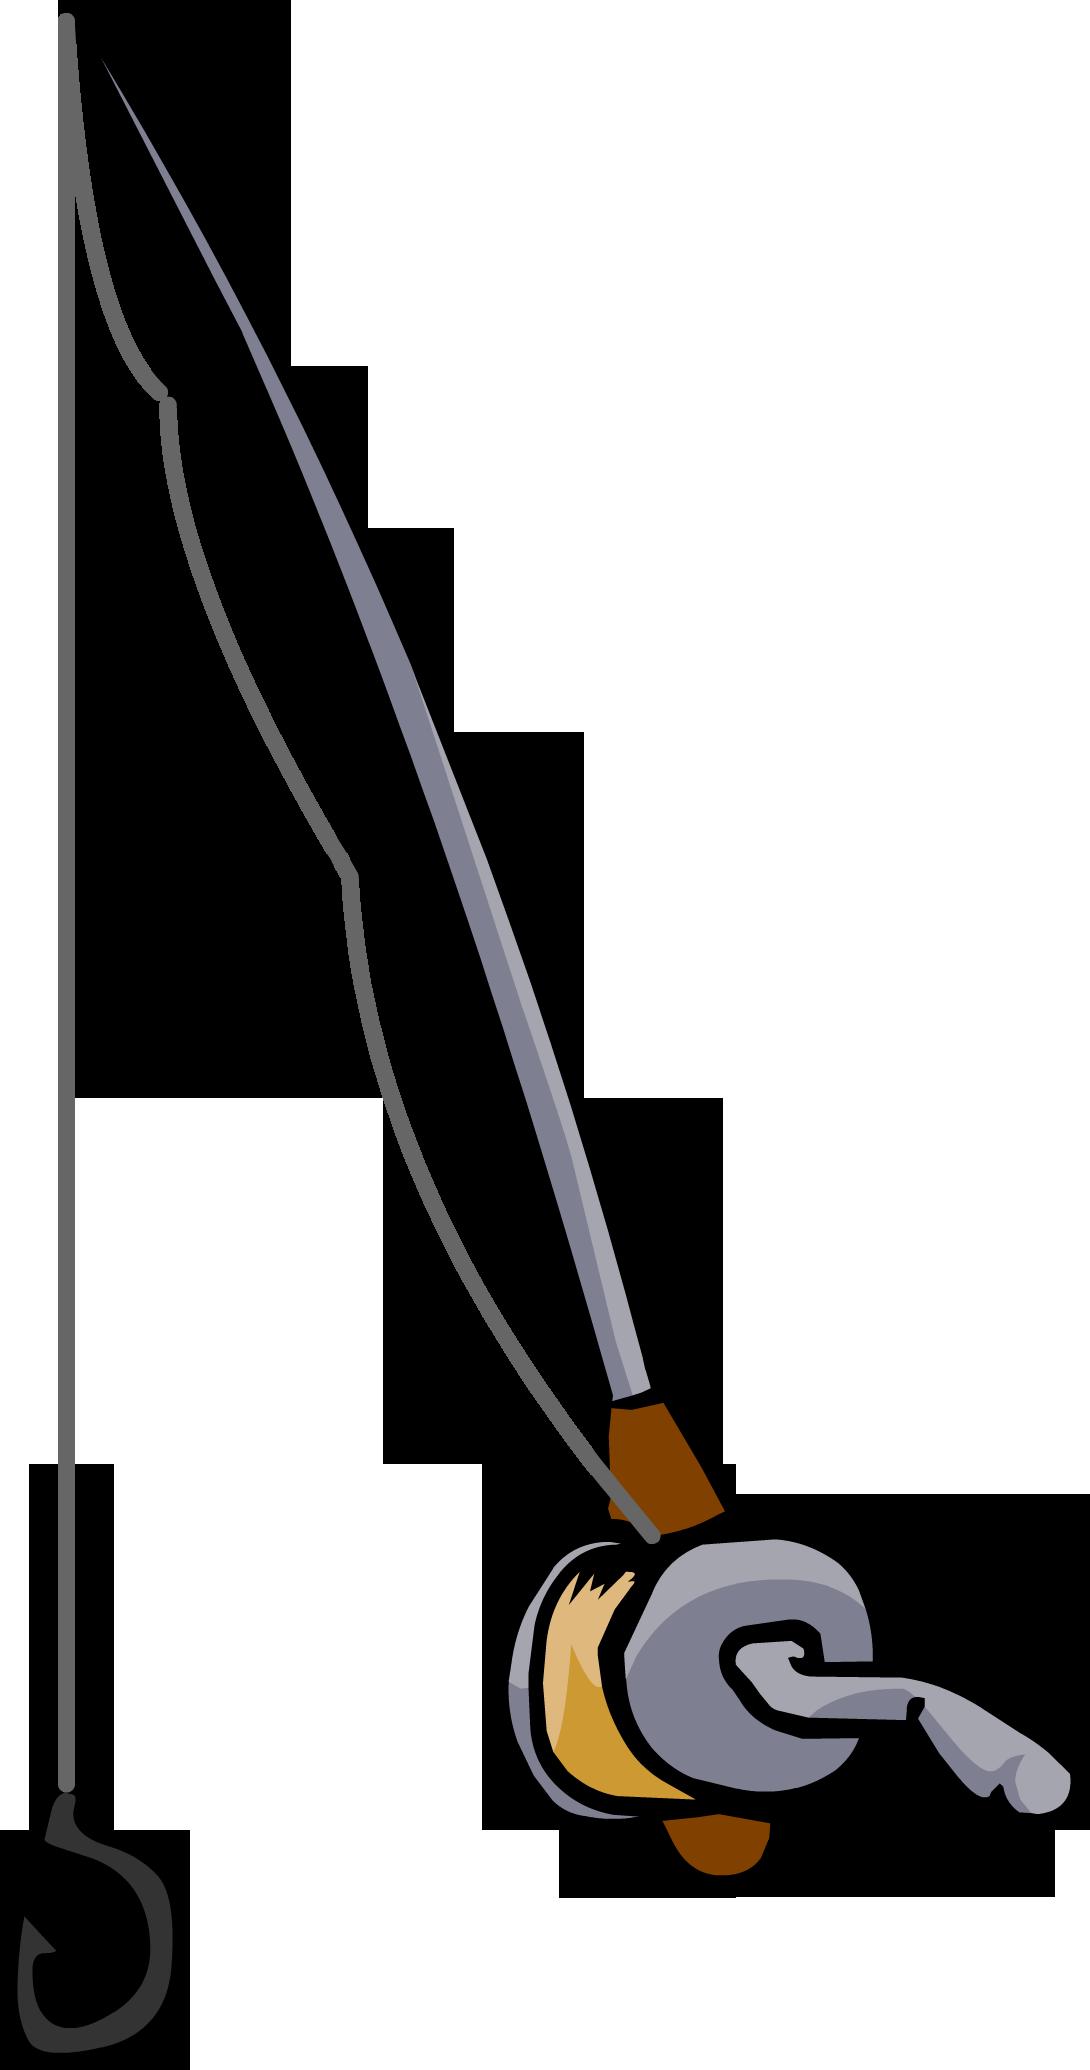 Lines clipart fishing pole Powered Penguin Club Fandom Fishing